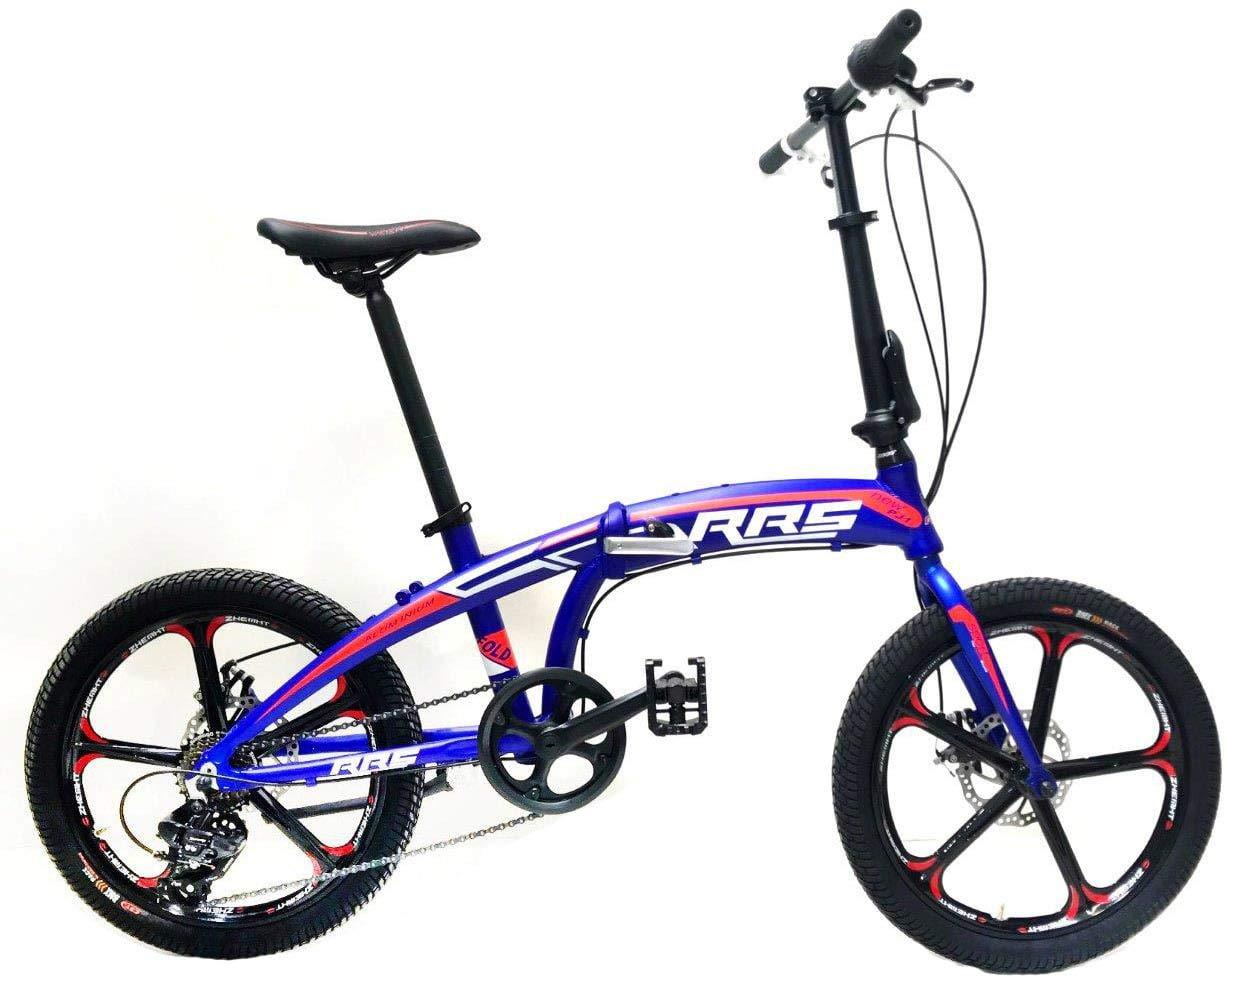 Reset Bicicletta Pieghevole 20 7v Ruote In Lega Broadway Blu Sgmstore